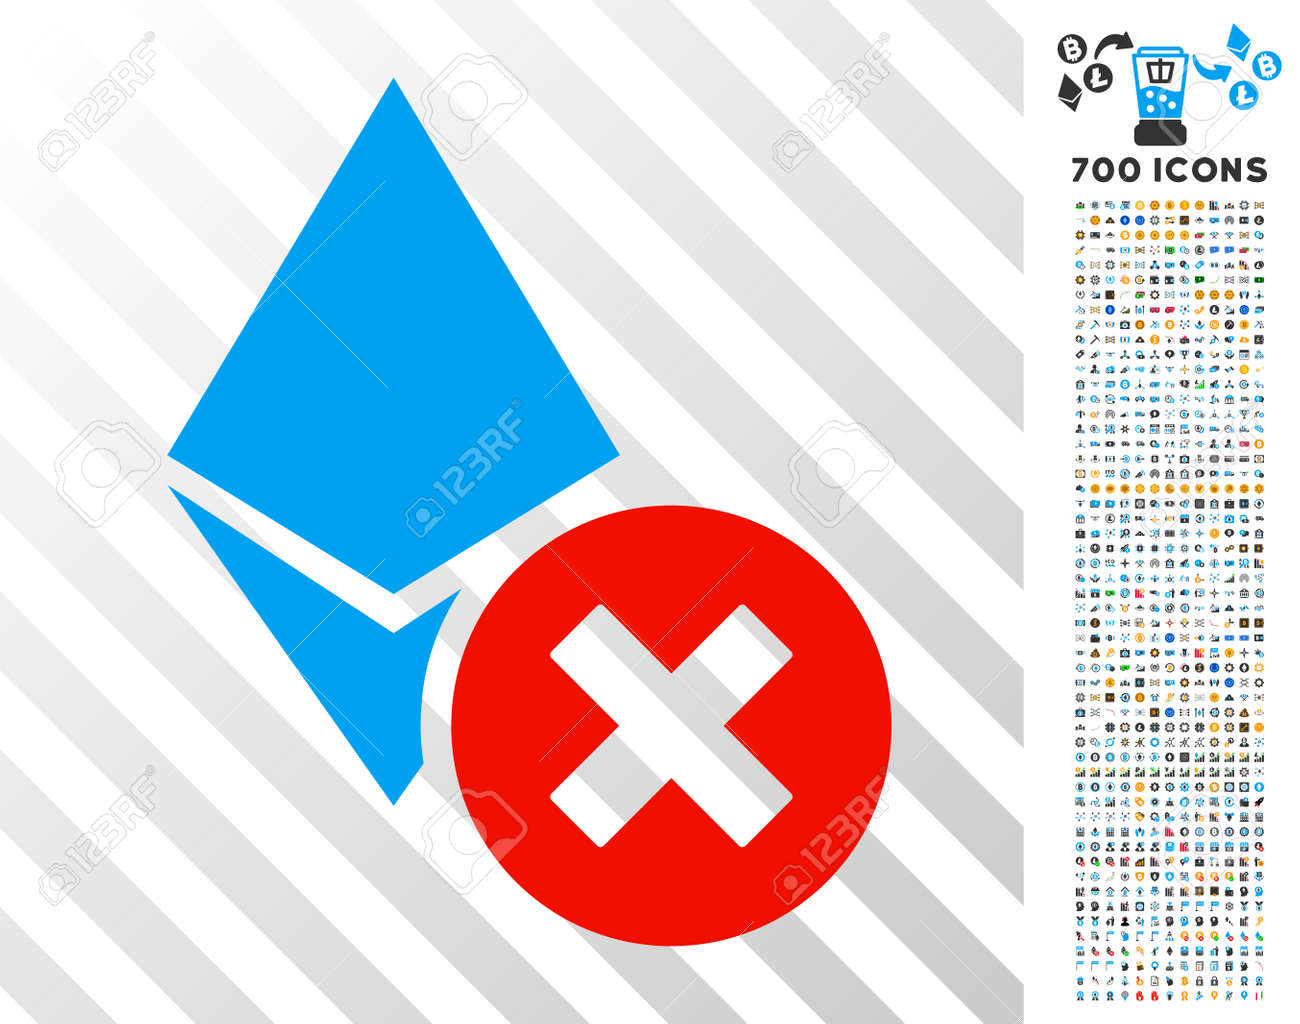 Bitmex futures trading